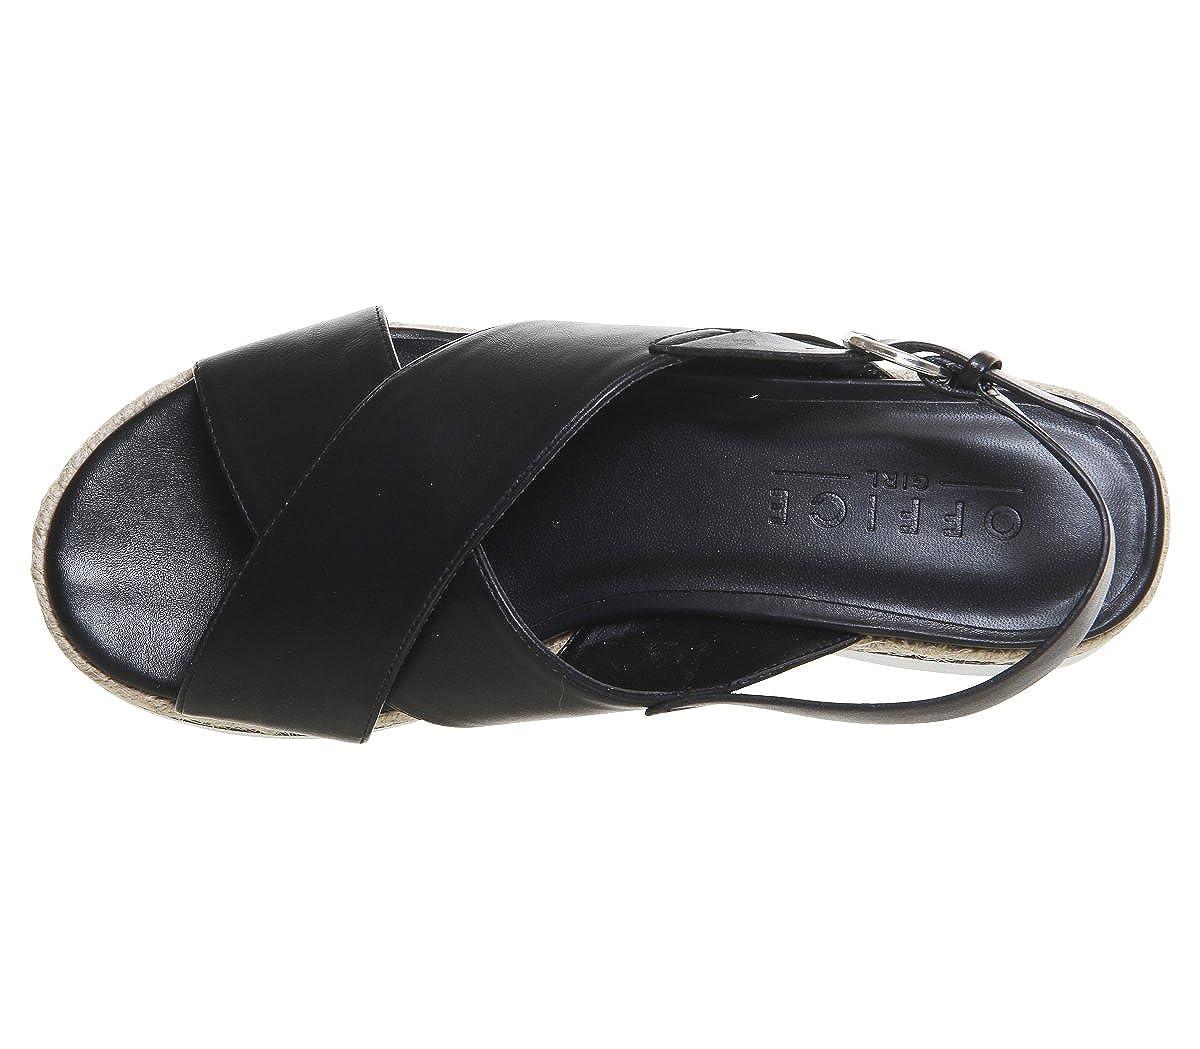 1b5b68b7b6d Office Saturn Cross Strap Espadrille Sandals Black - 4 UK  Amazon.co.uk   Shoes   Bags